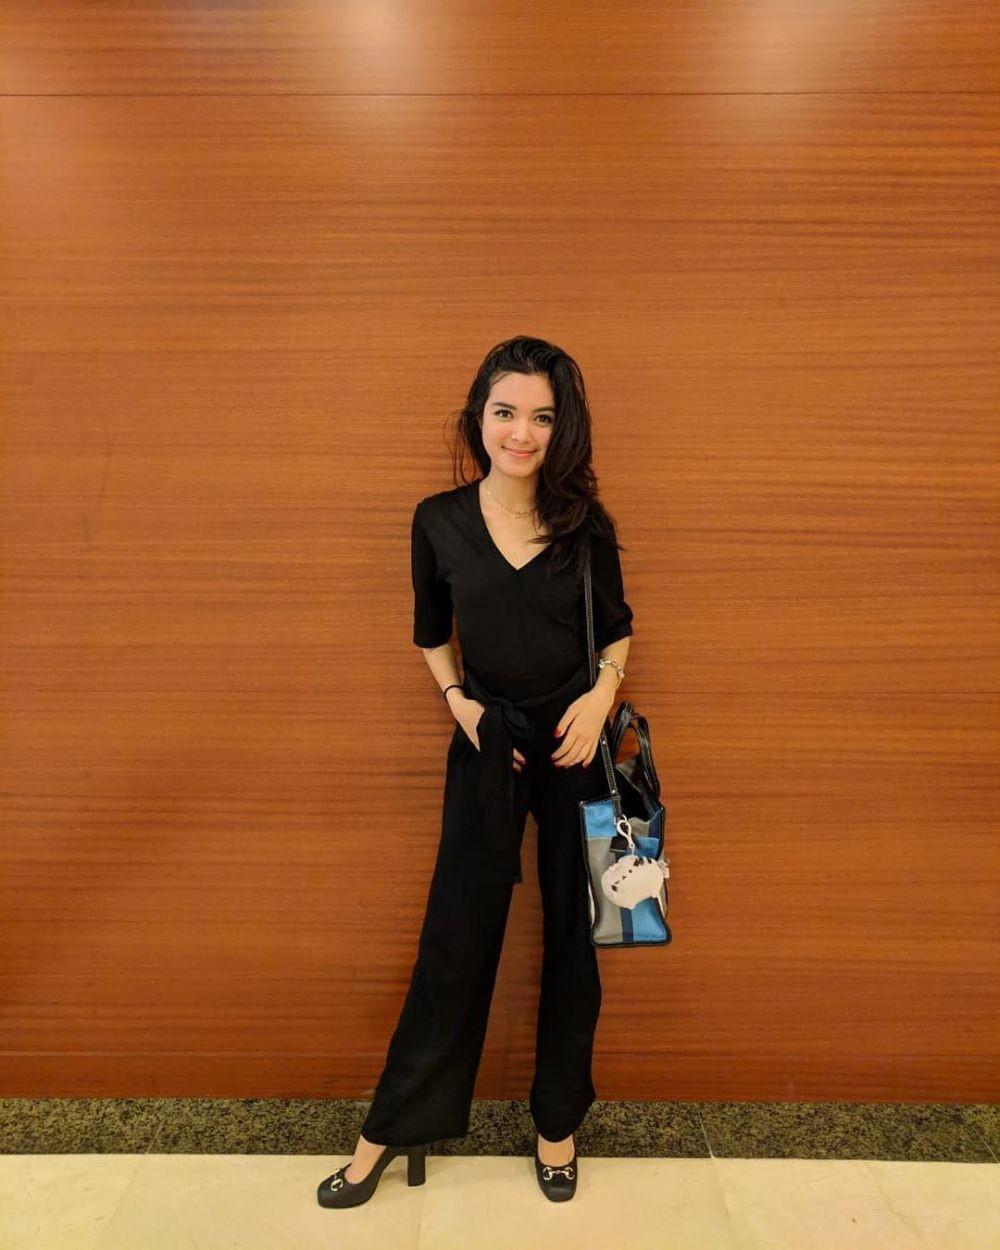 10 Pesona Claudia Andhara, Artis Muda Langganan Sinetron Indonesia